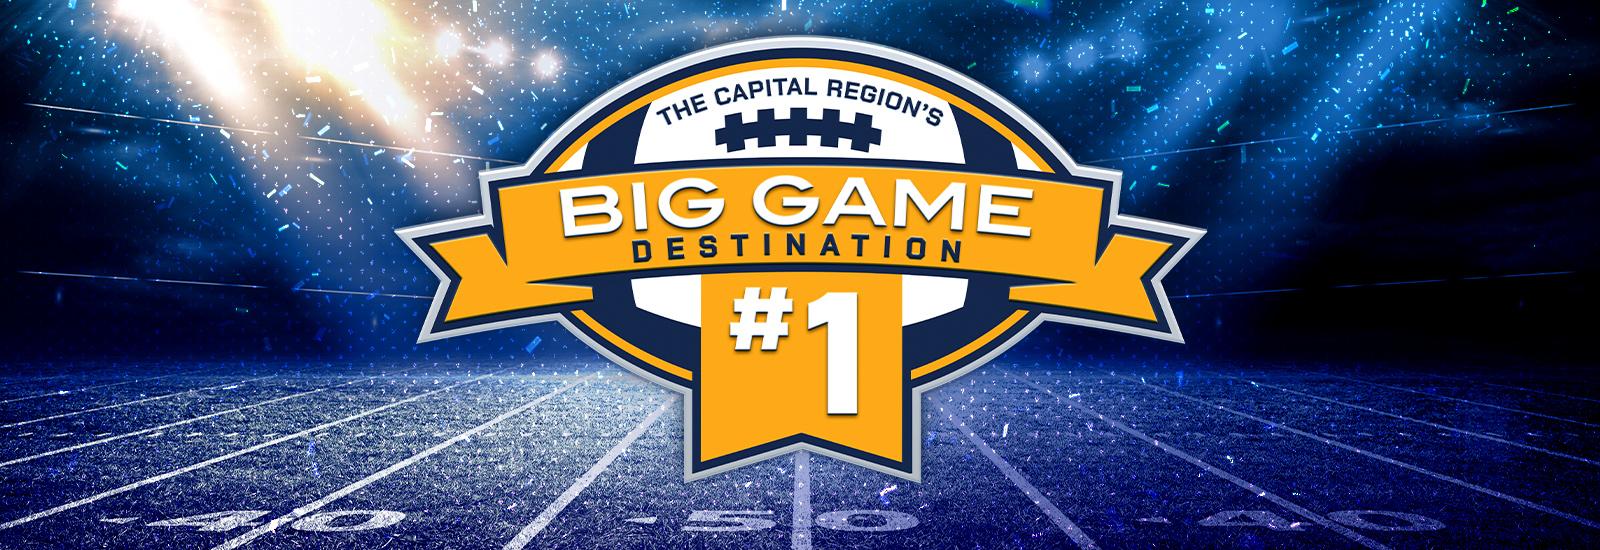 Big Game Destination